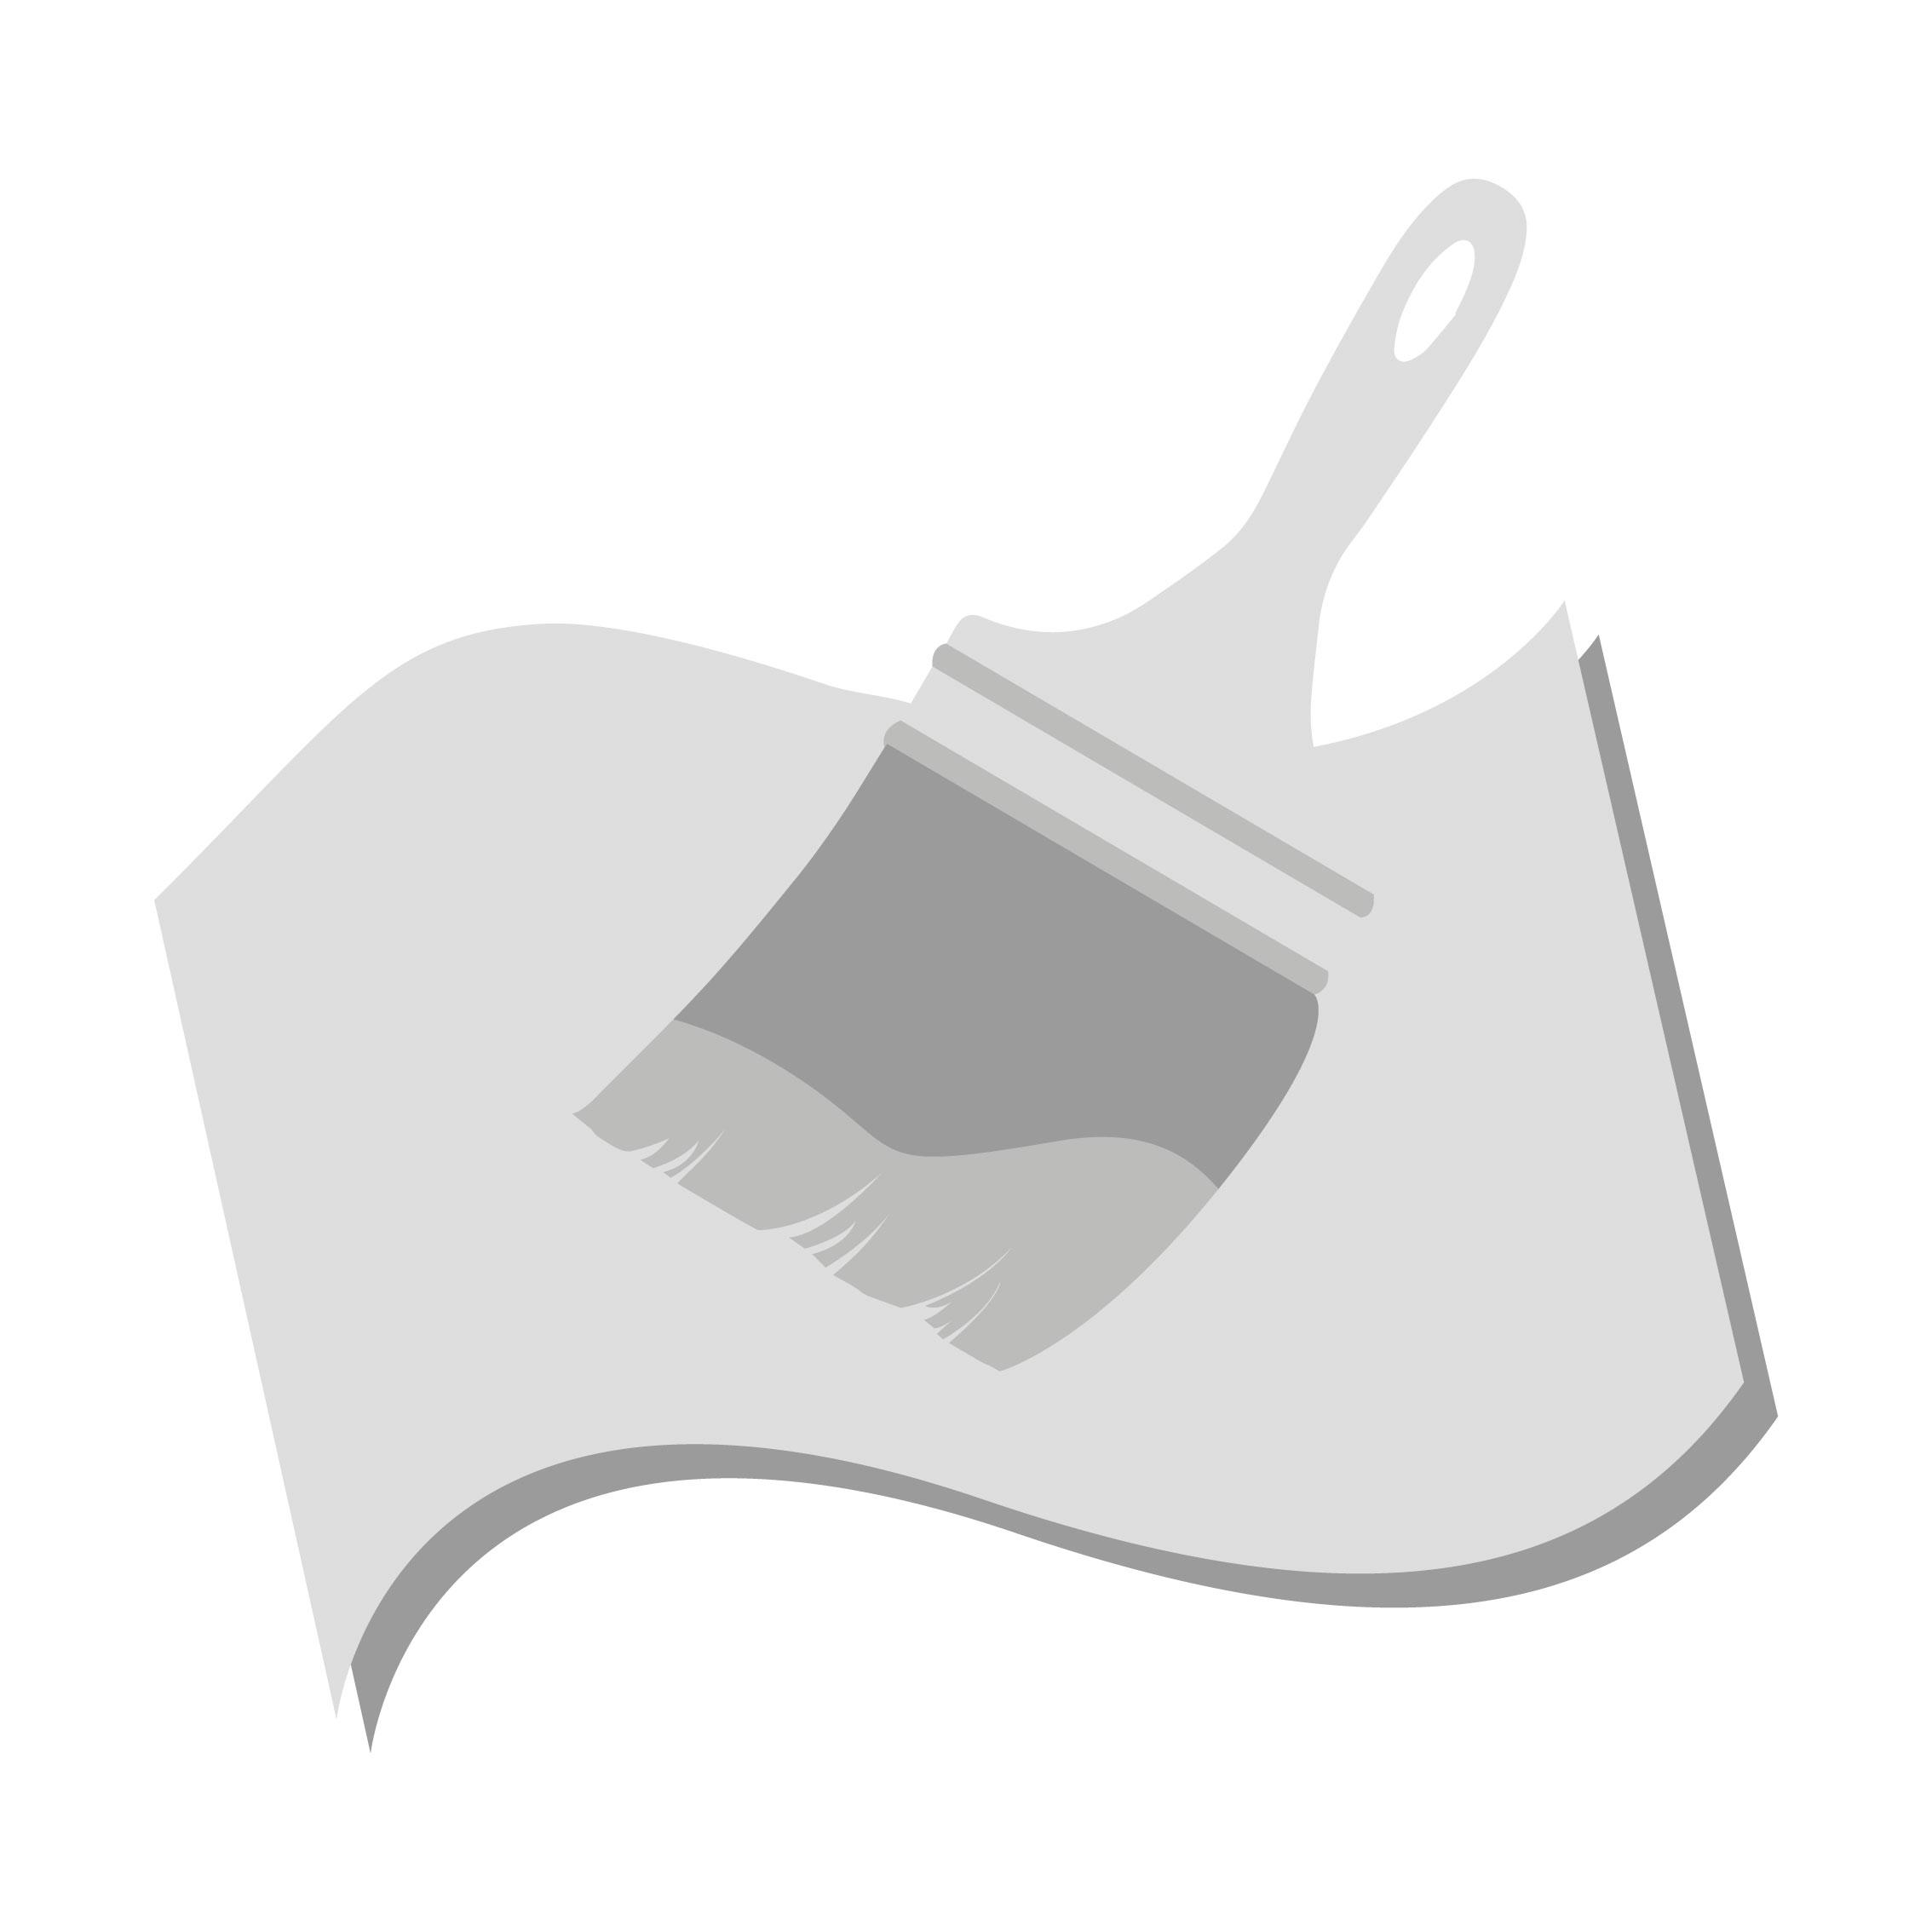 Signaal Vlaggenservice - Vlaggen ontwerpen